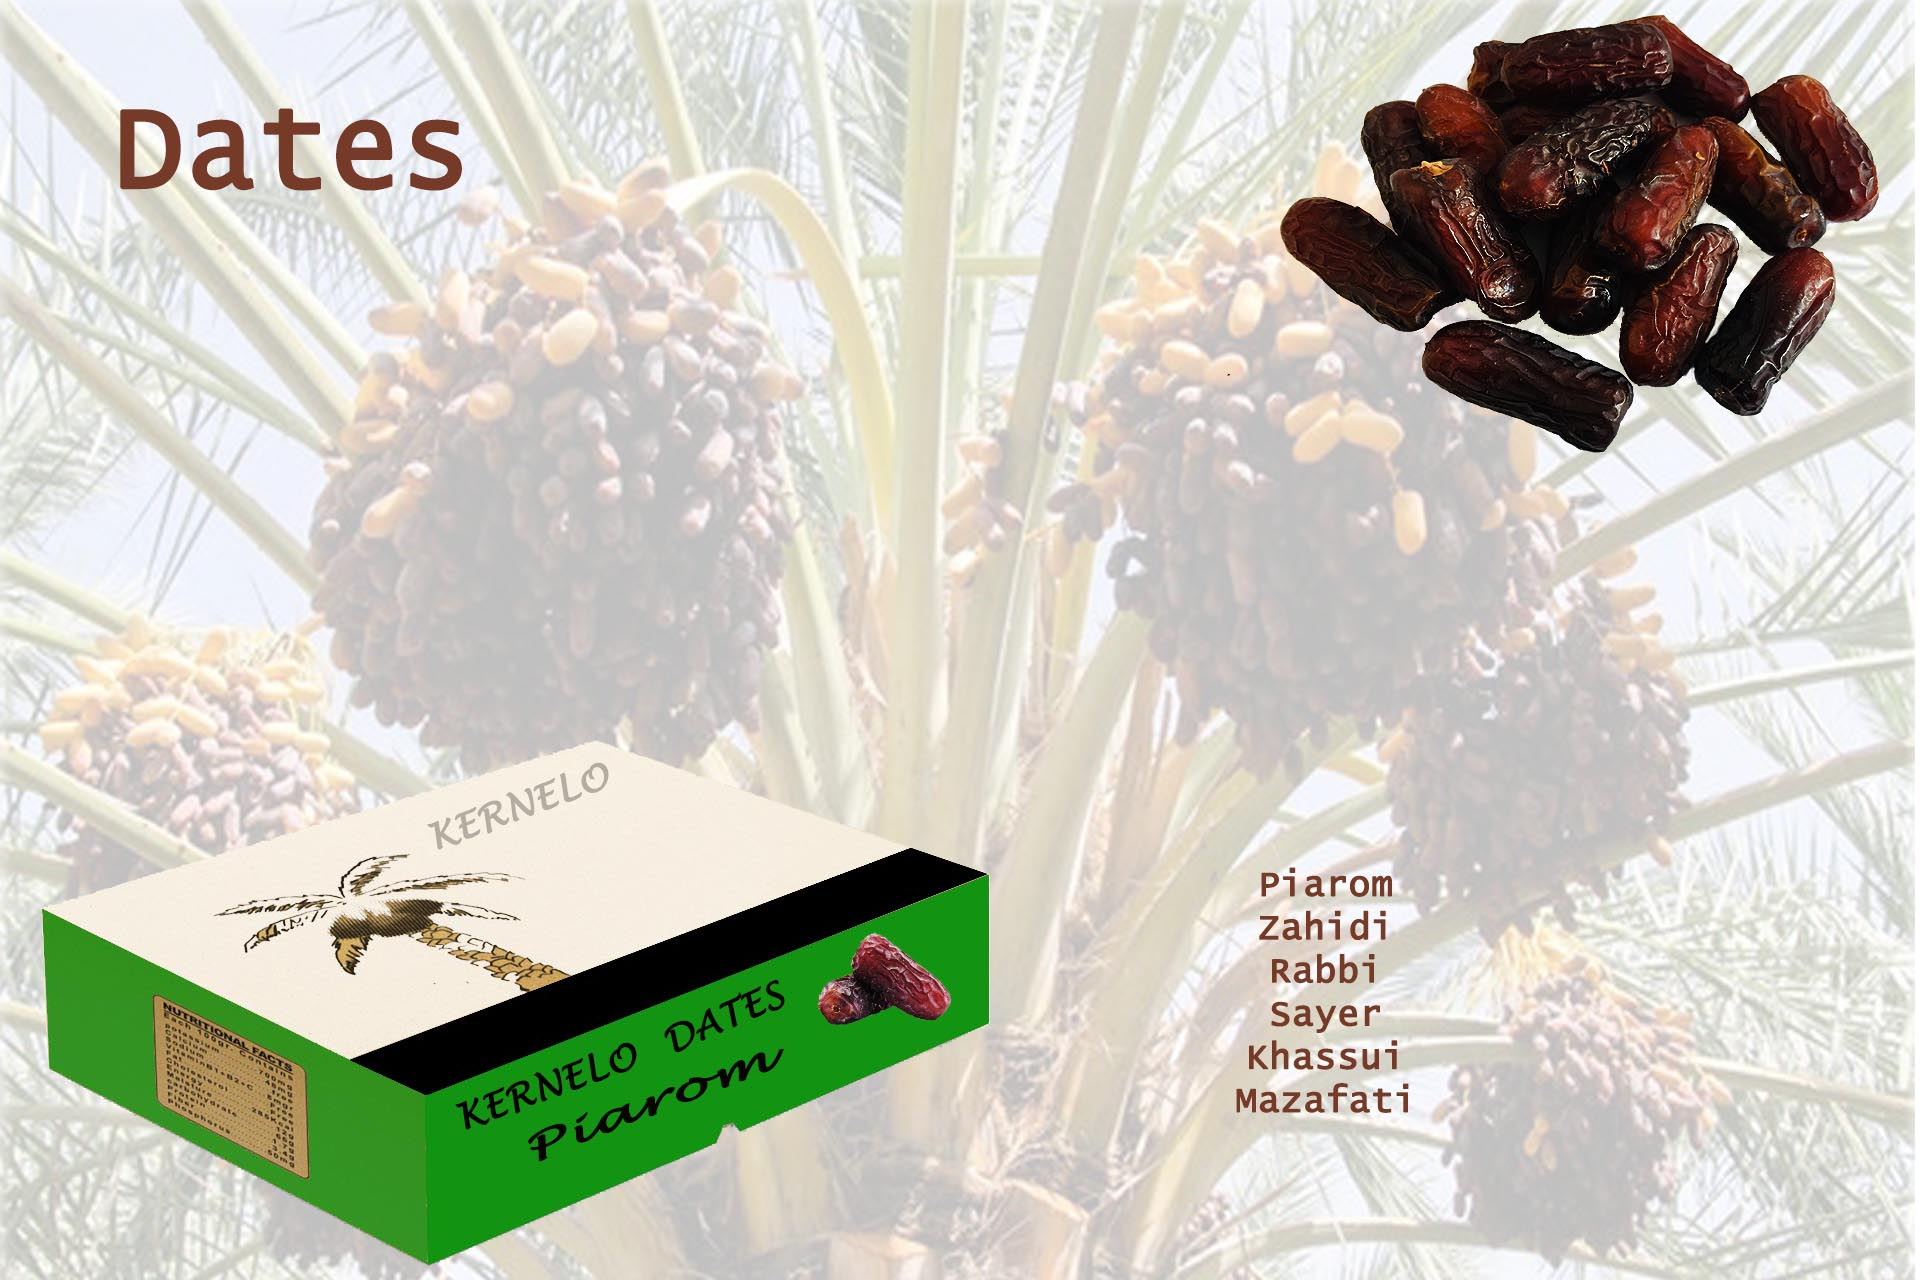 kernelo dates wholesale piarom zahidi nutskala price bazaar syrup chopped